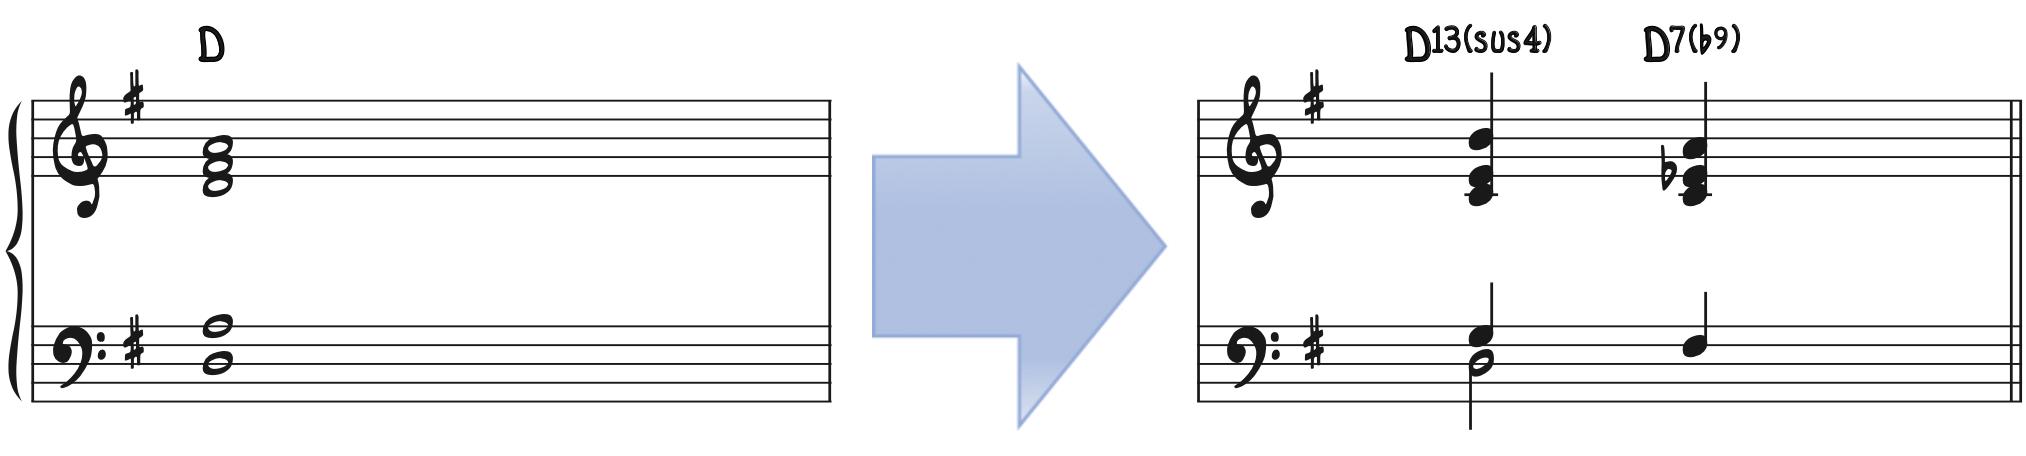 Jazzy D13(sus4) Dominant Voicing